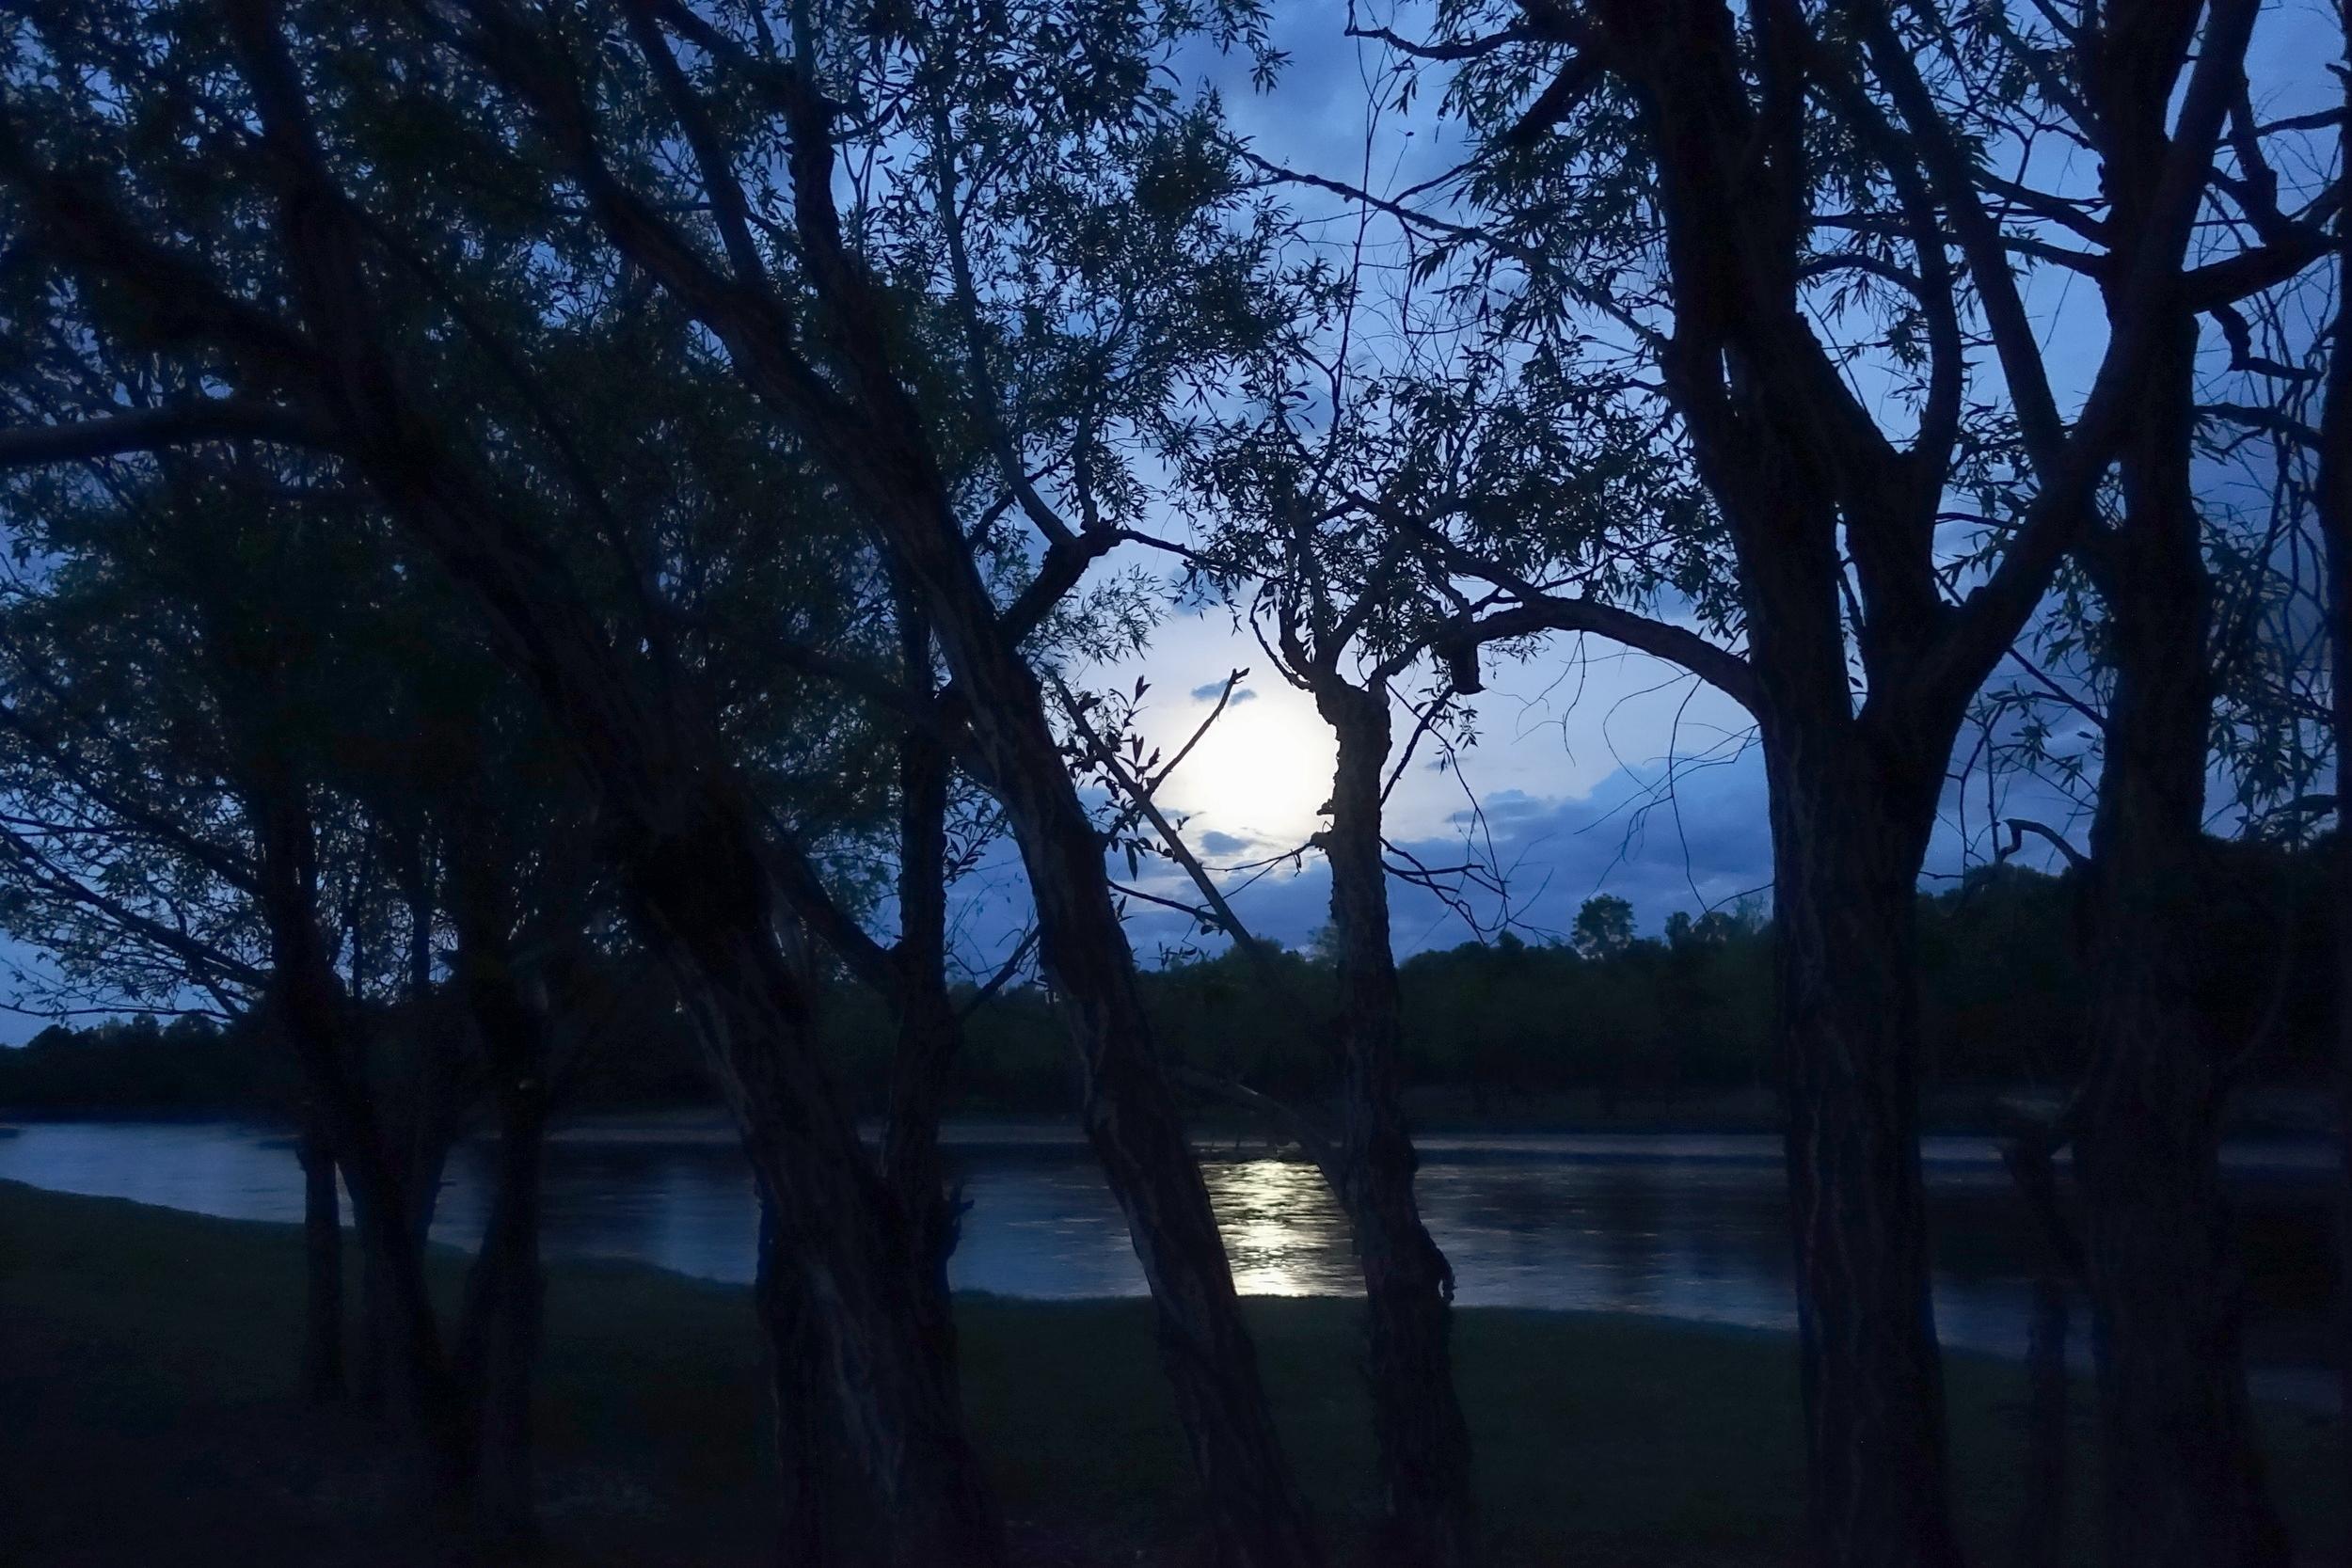 6 unforgettable moonlit nights spent in tents in the Terelj national park